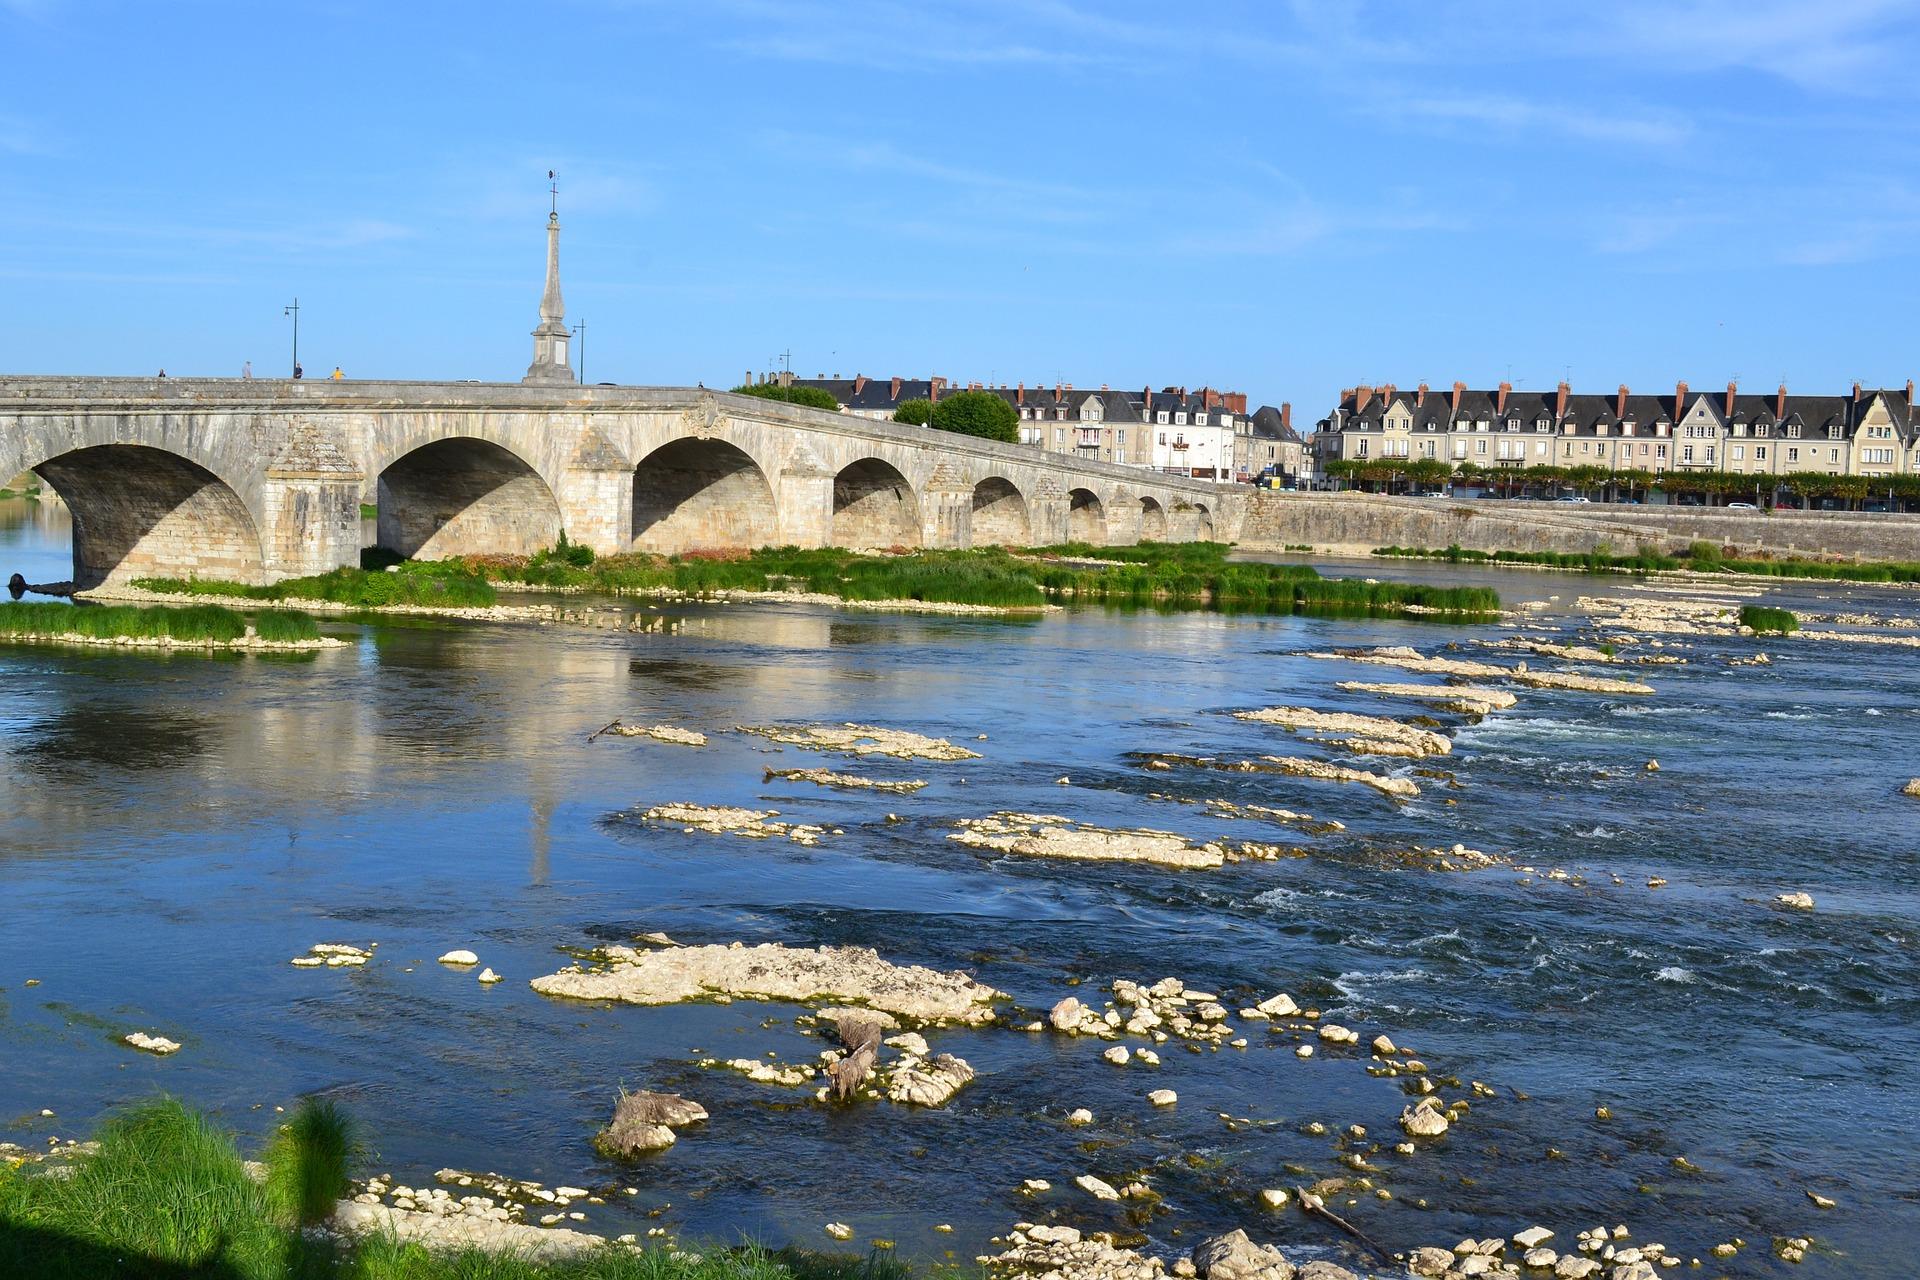 Die Loire bei Blois